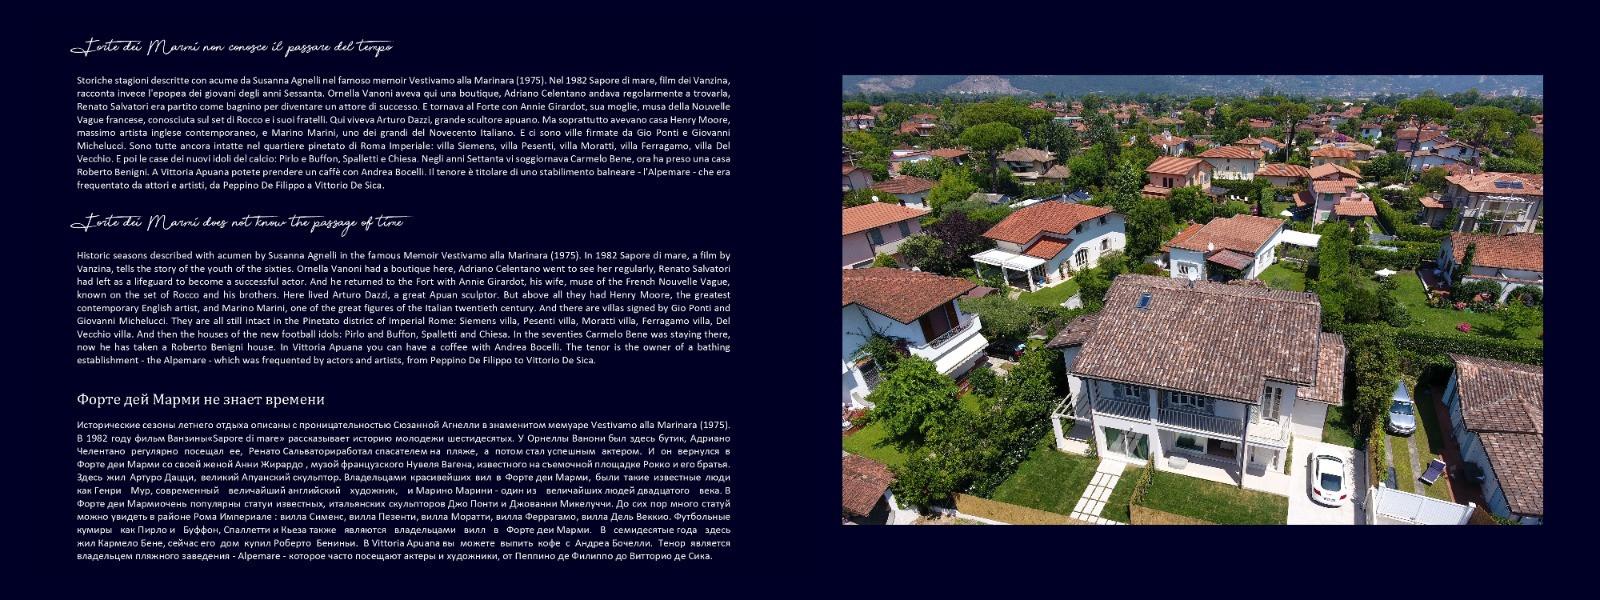 Impresa edile Roma Imperiale Luxury Services Forte dei Marmi